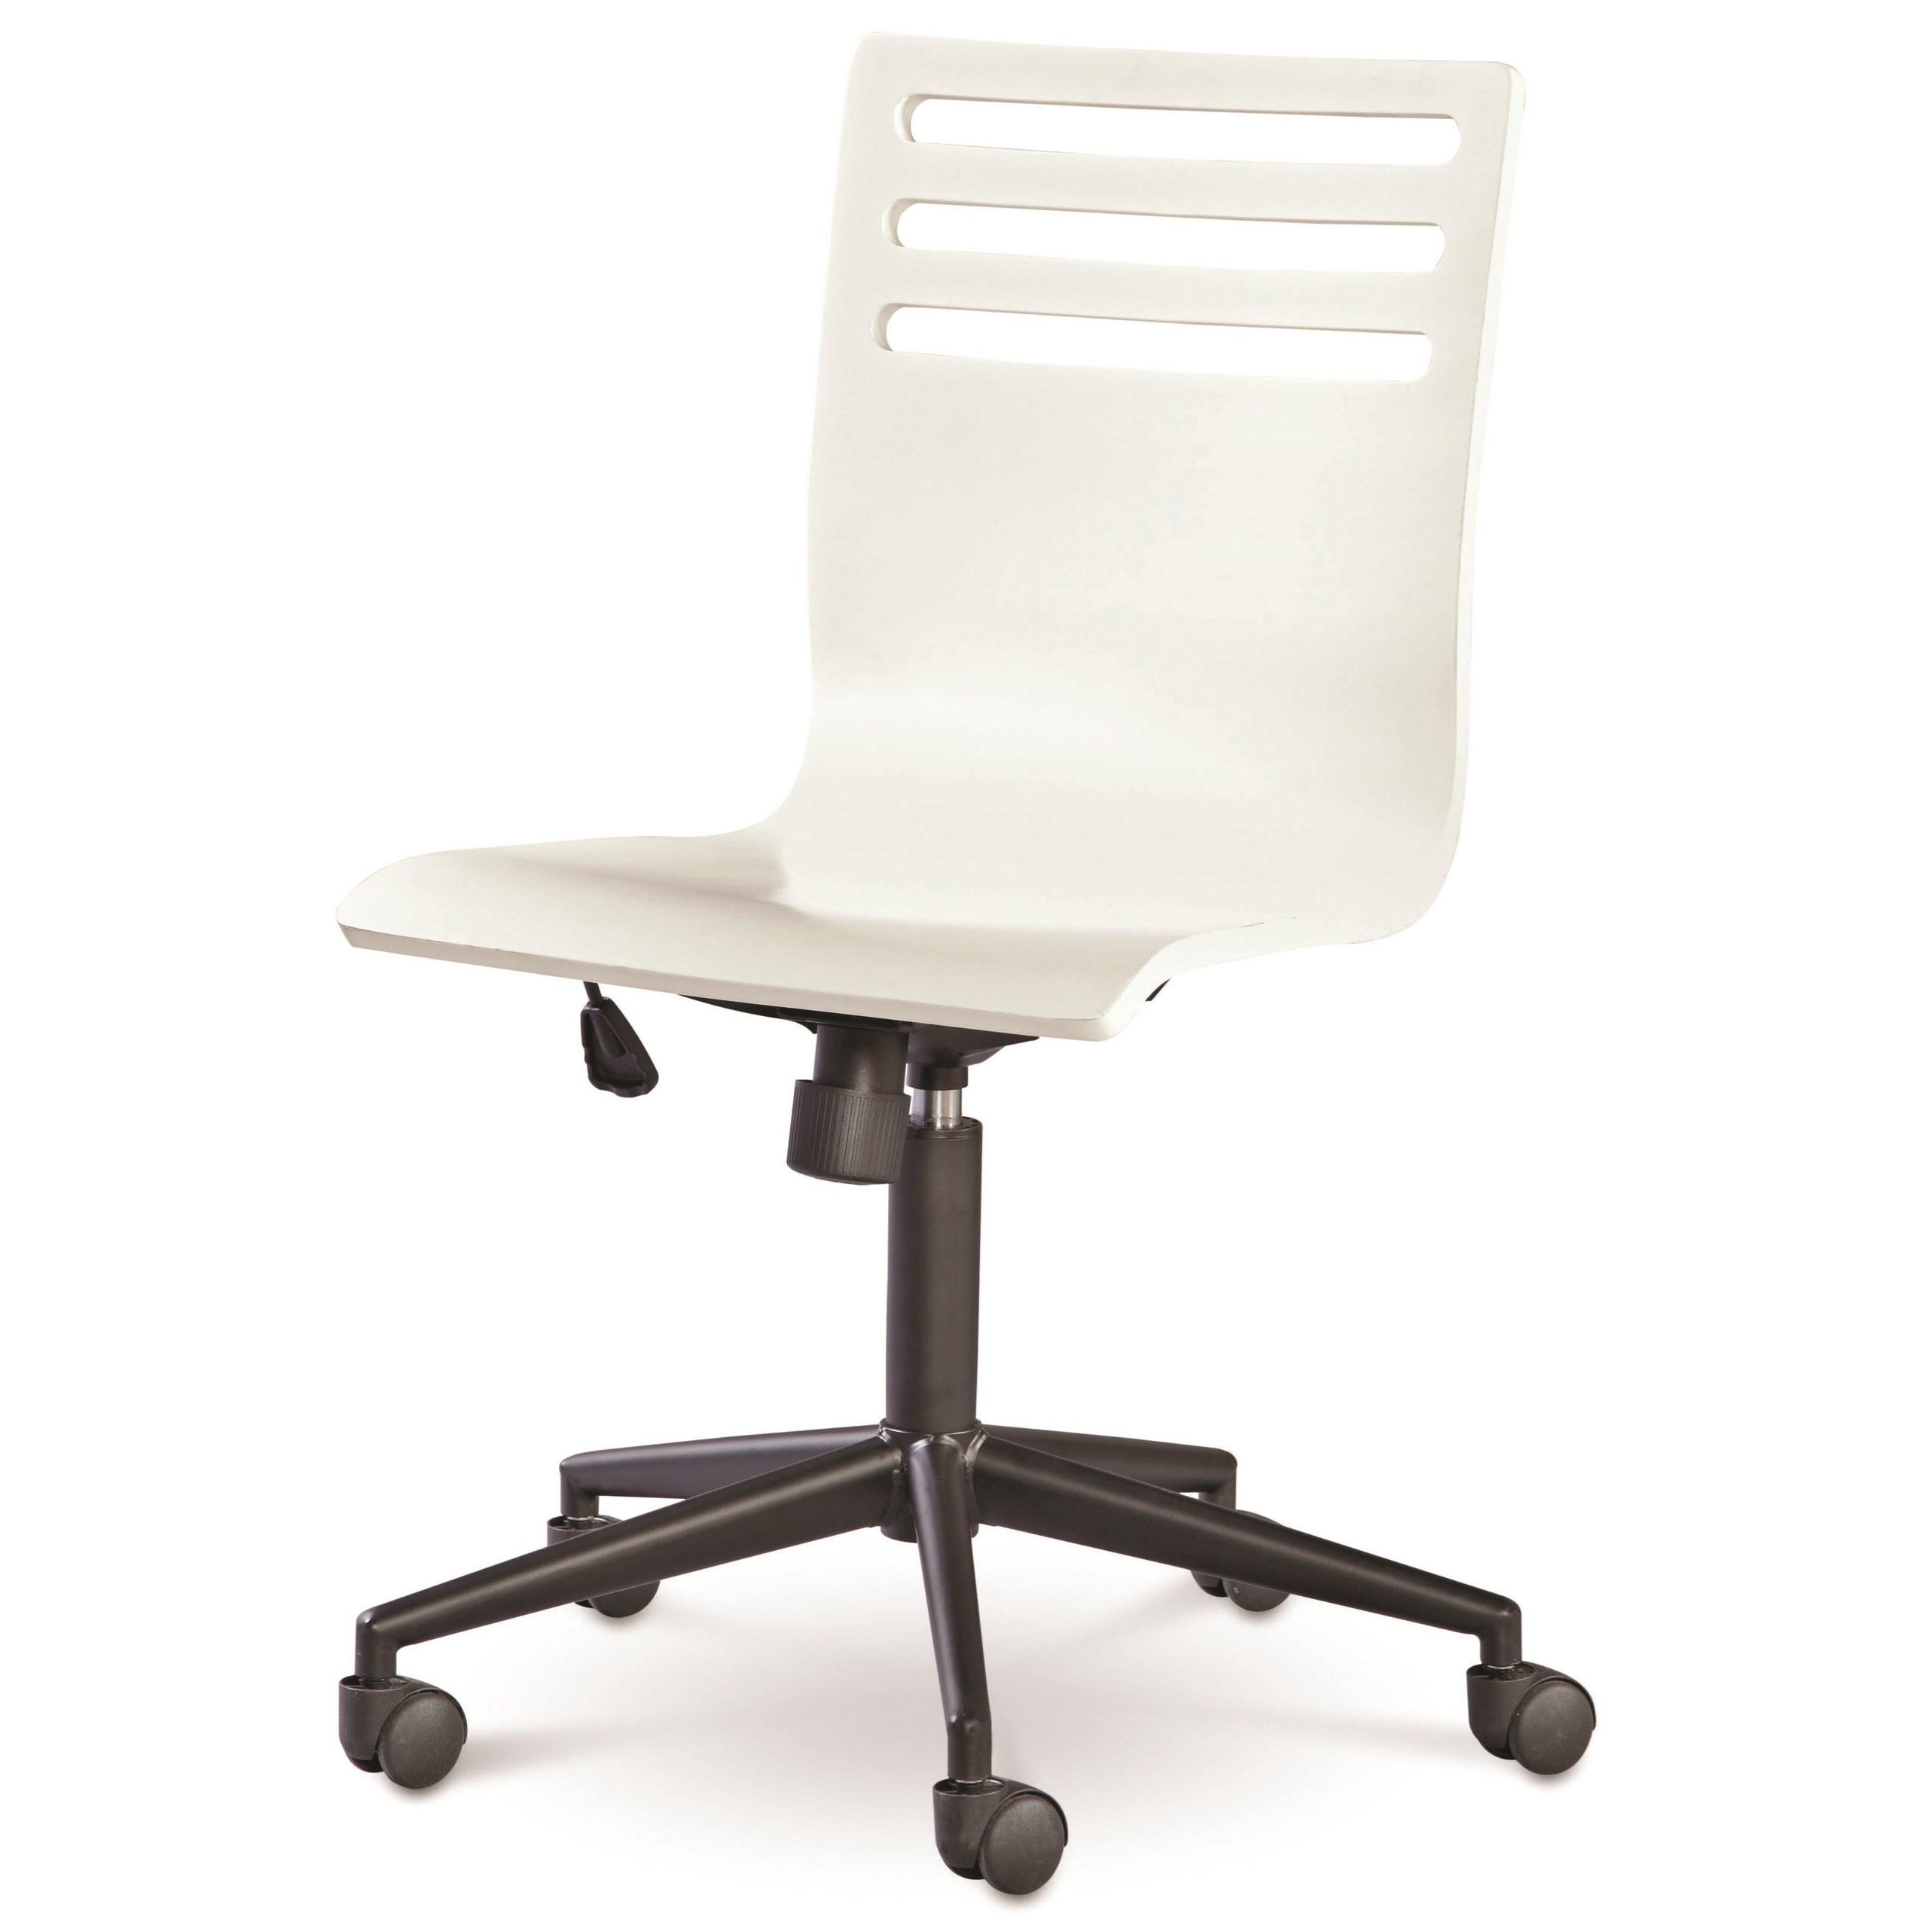 Smartstuff Classics 4.0 Swivel Desk Chair - Item Number: 131A071